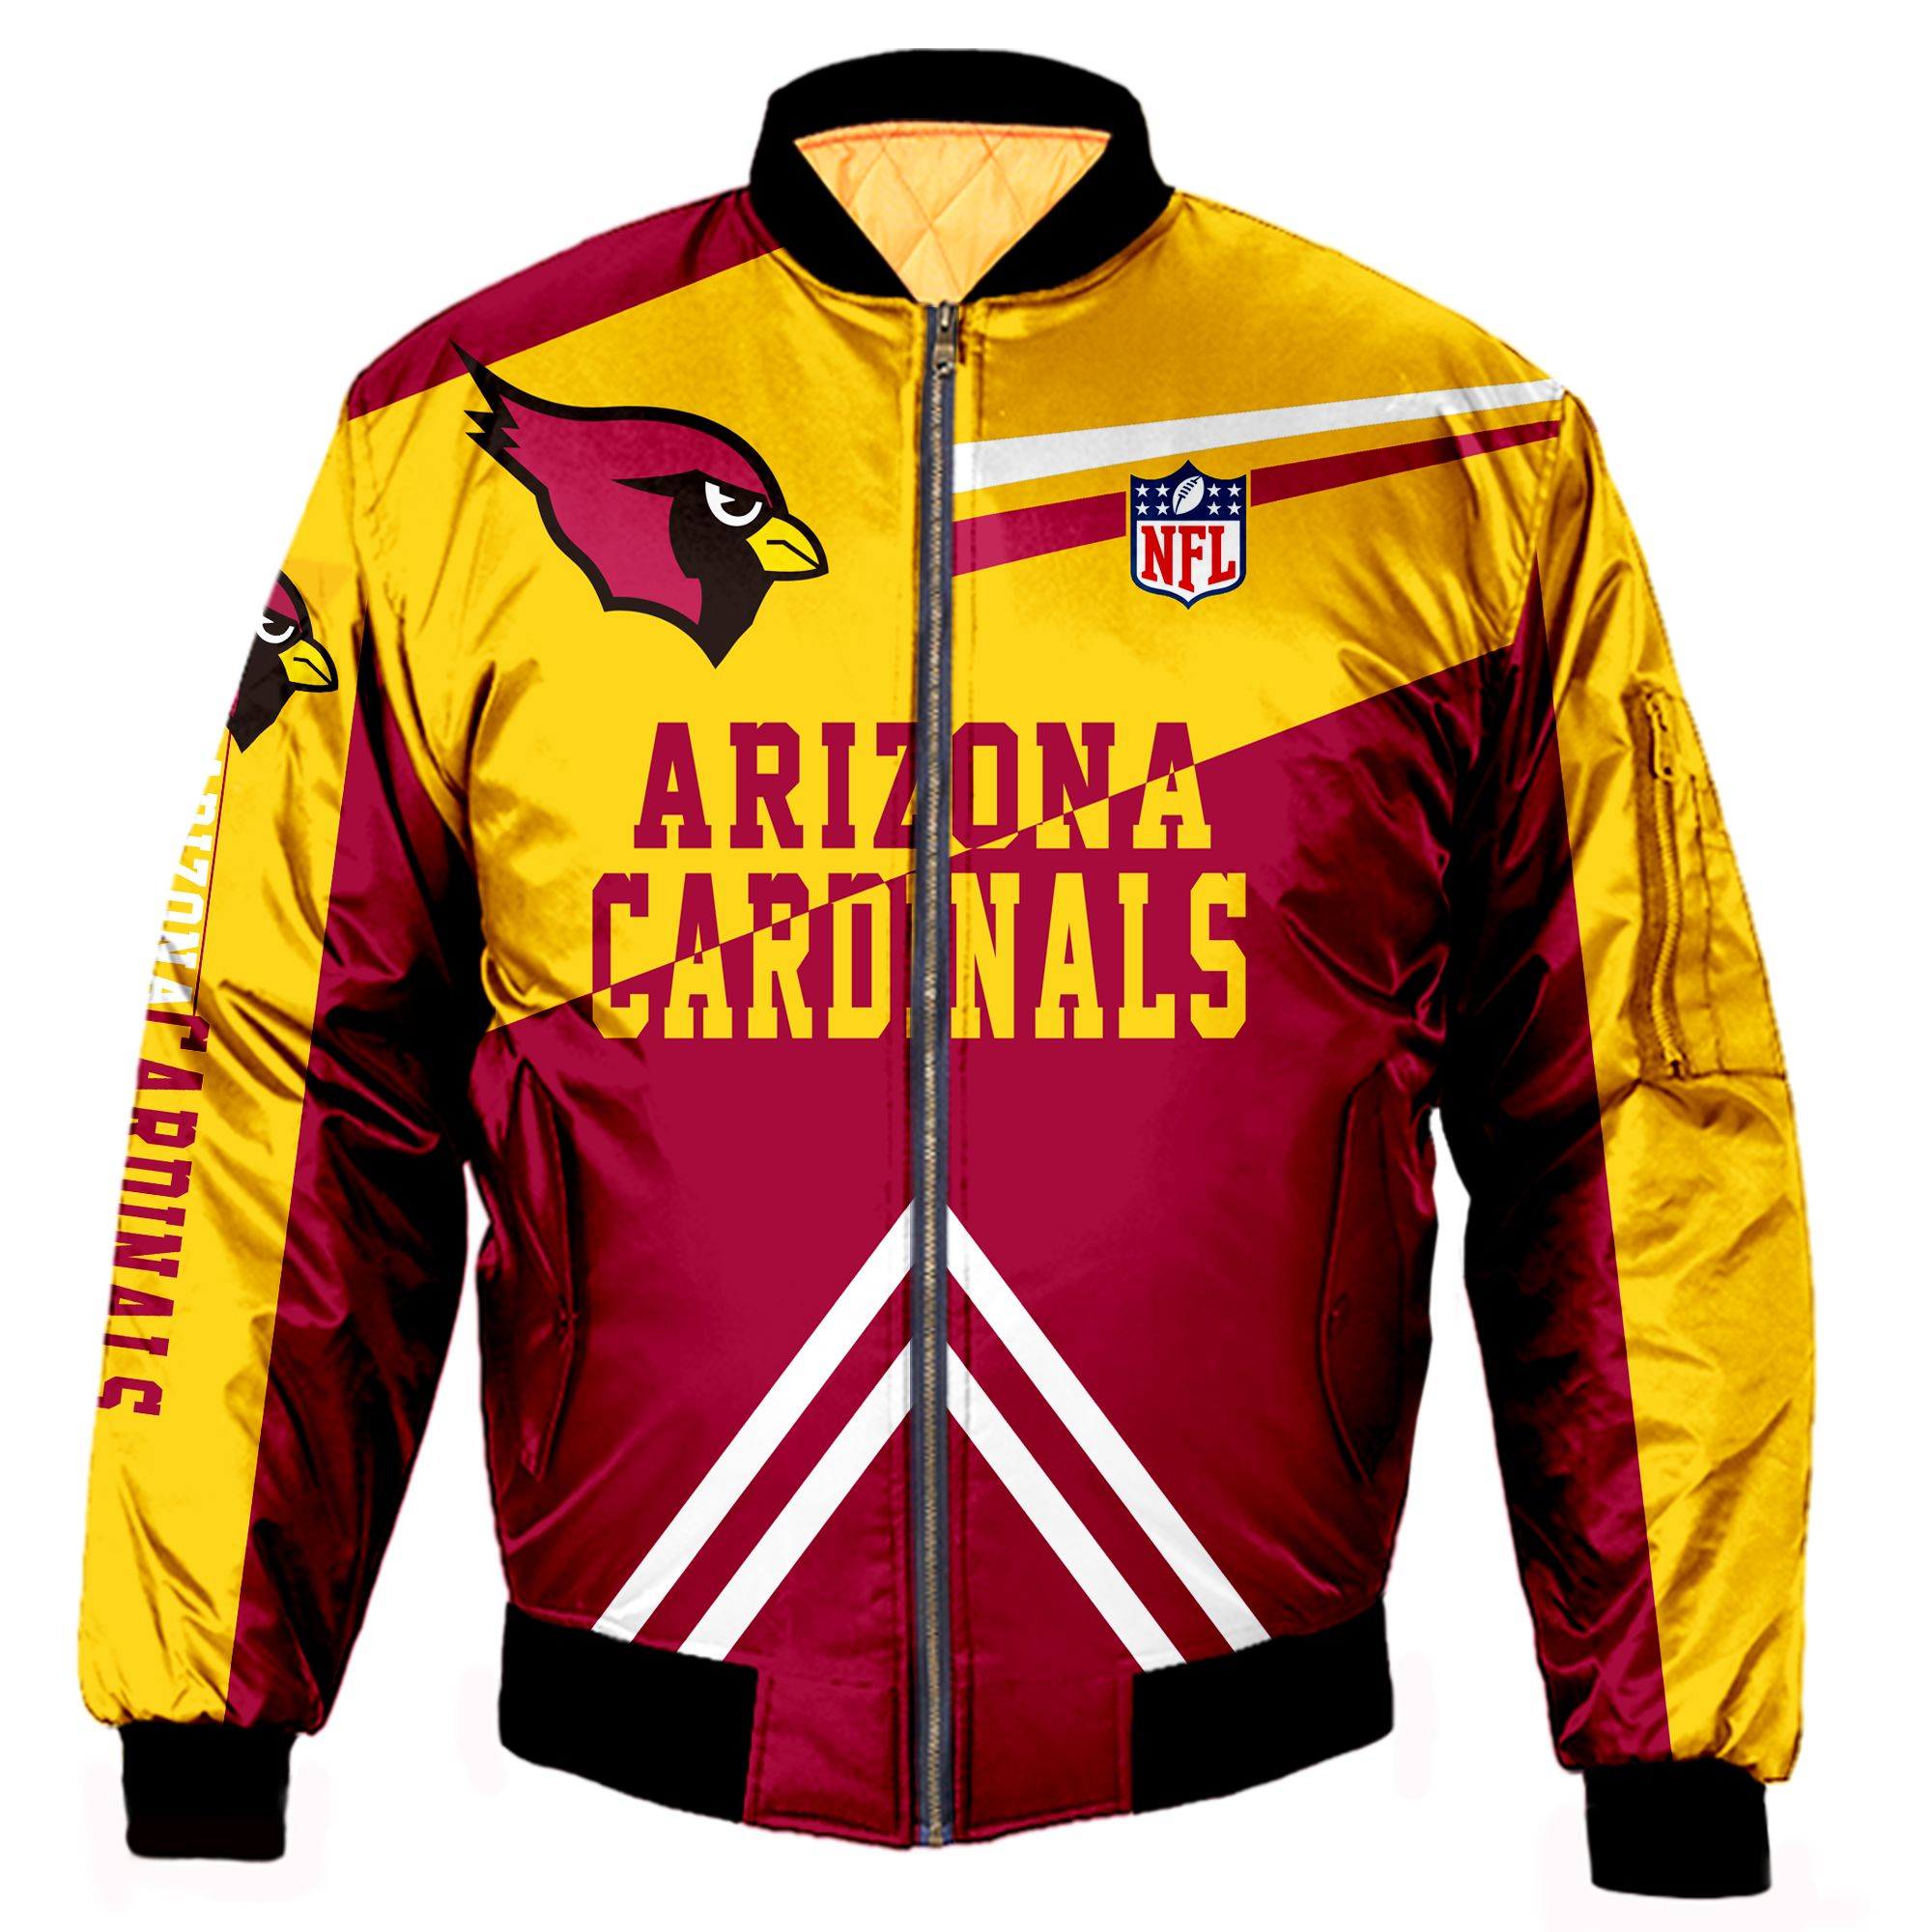 Arizona Cardinals Fans Bomber Jacket Men Women Cotton